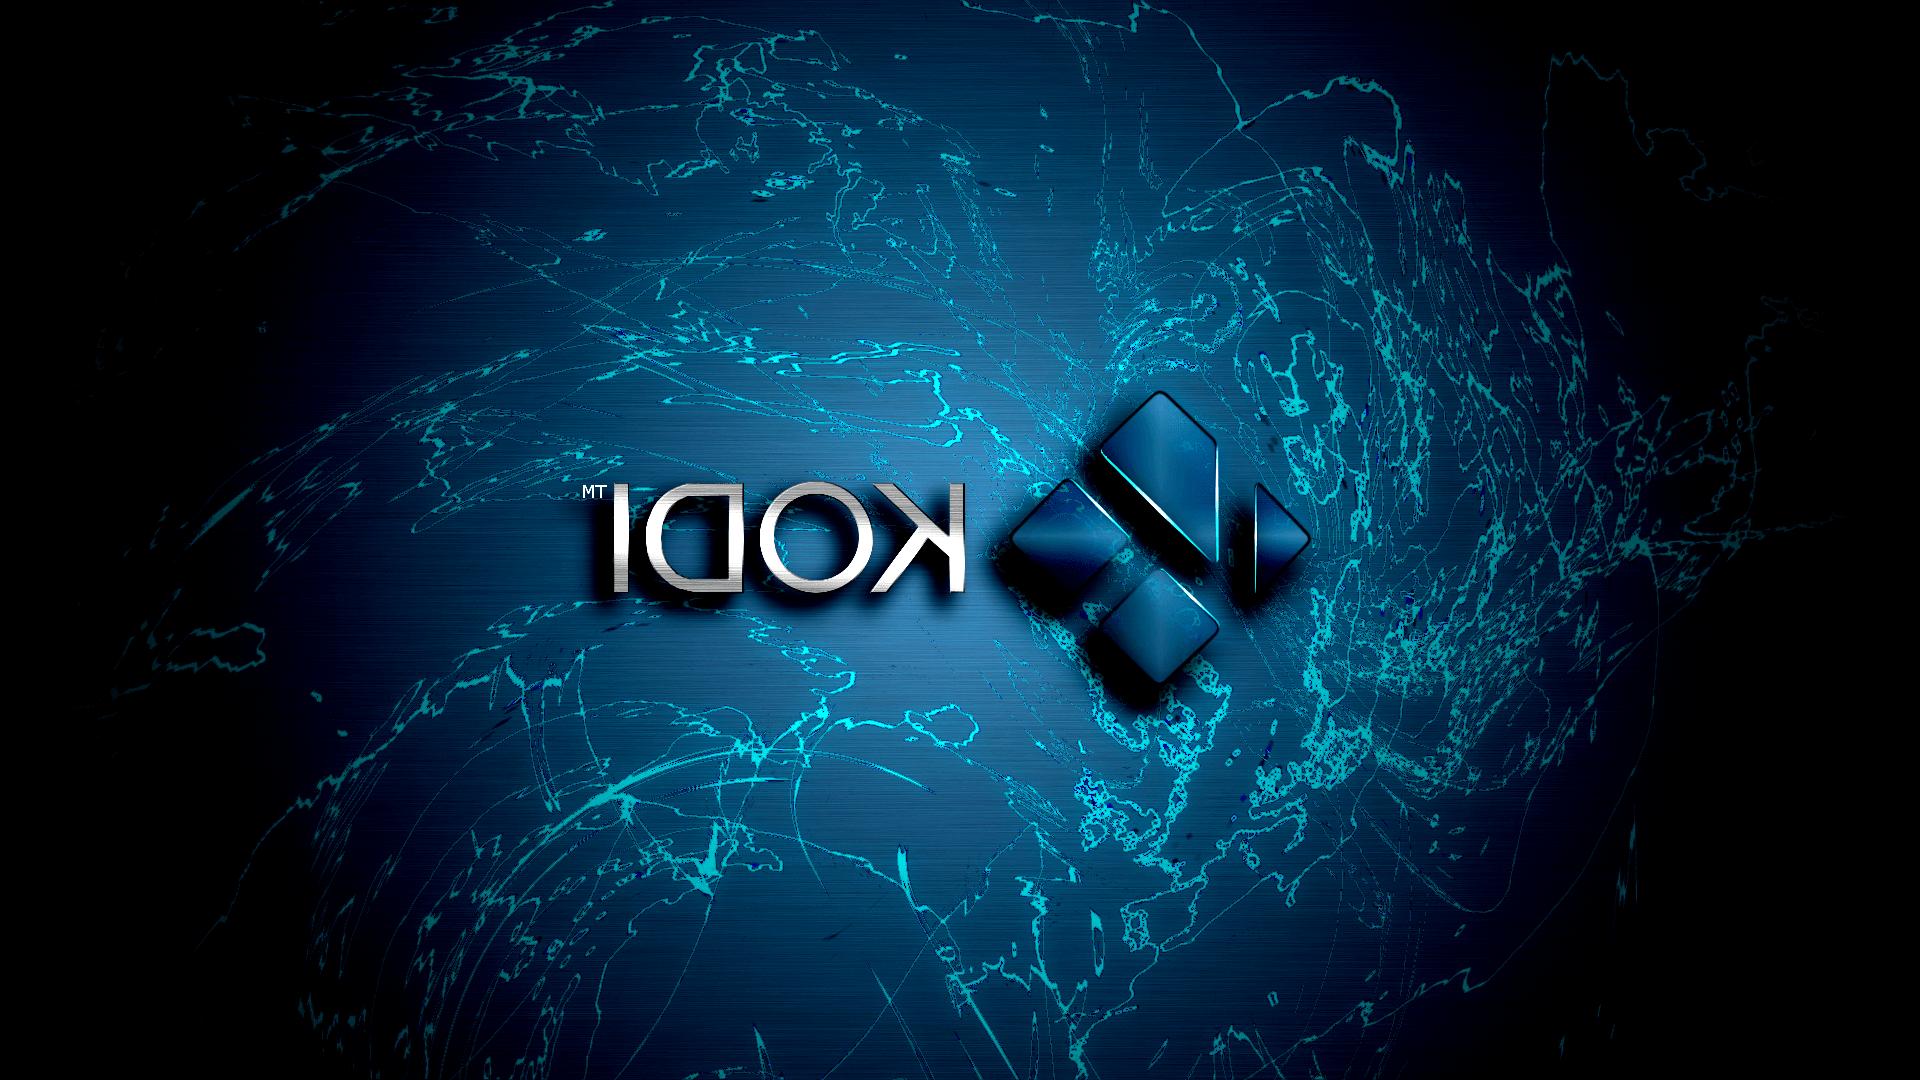 You Can Download Kodi 19 Matrix Ipa And Deb Files For Your A In 2020 Kodi Apple Tv Ipa